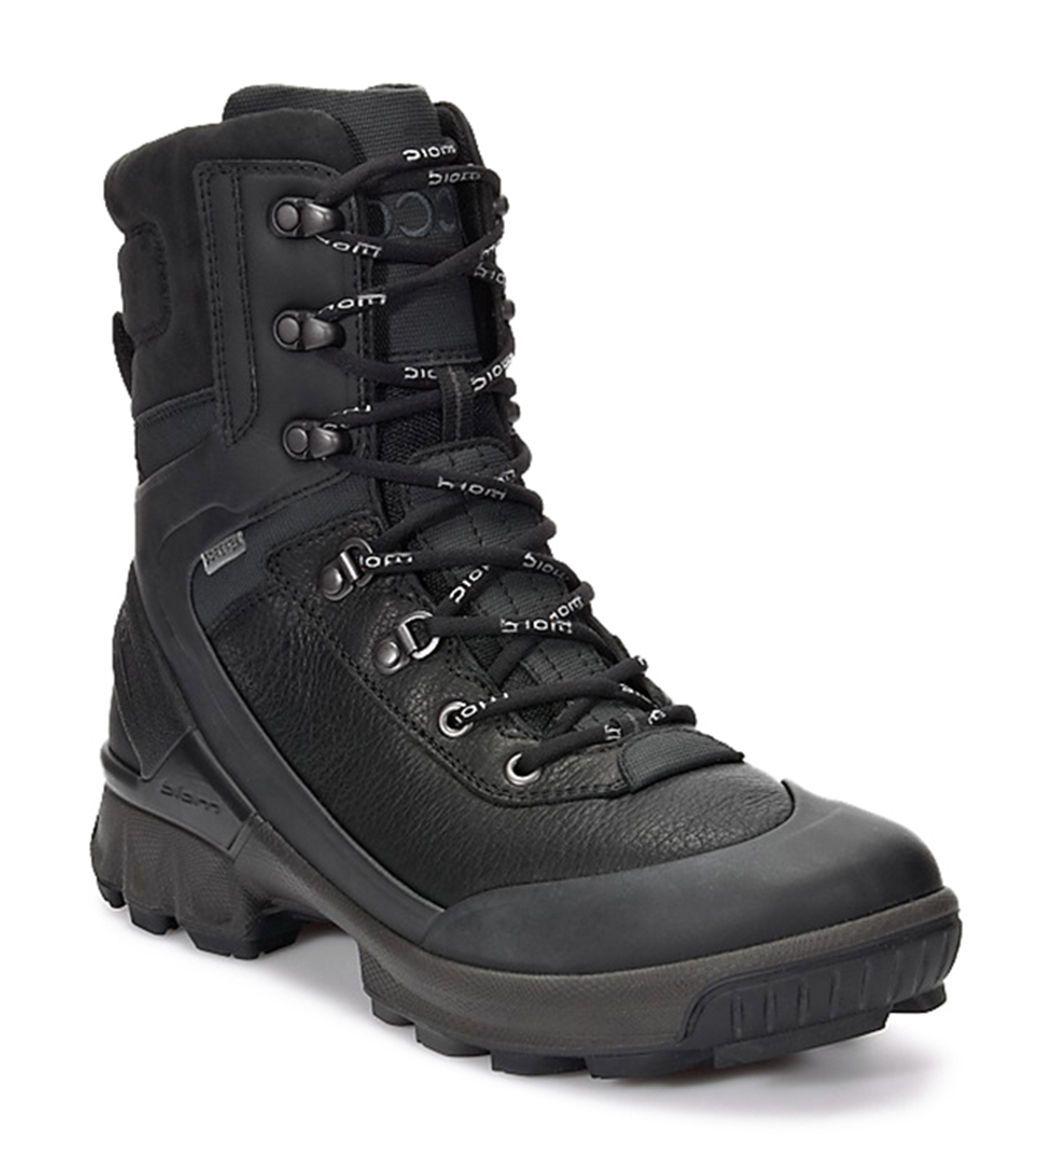 BIOM Hike 1.4 | Sport | Mens Hiking Boots | ECCO USA · BurrosModa Para  HombresBotasZapatosTecnologiaBotas De Montaña ...